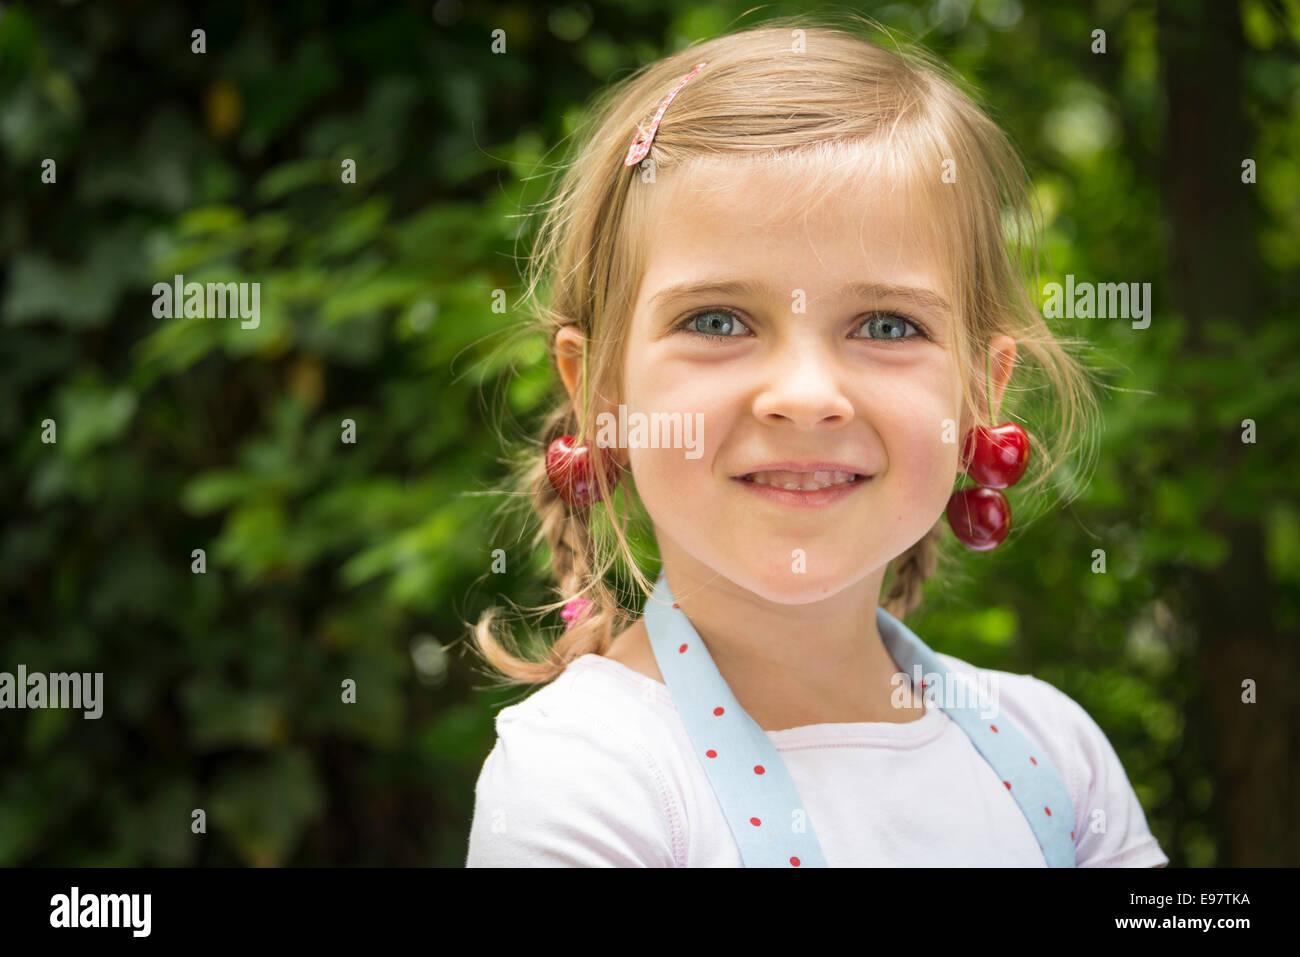 Portrait of little girl, cherries dangling from her ears - Stock Image